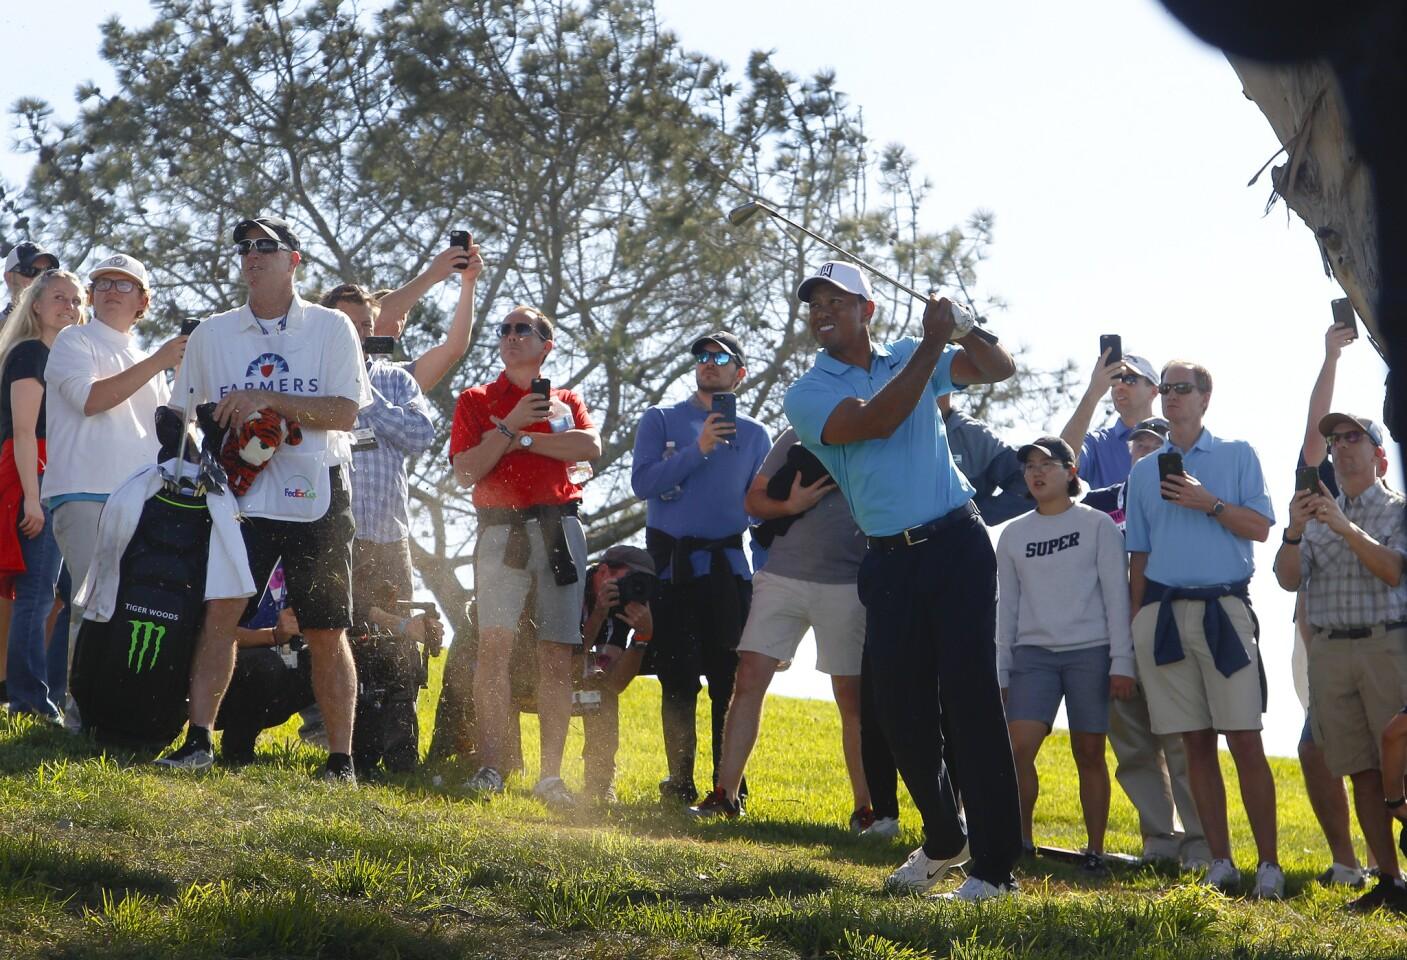 Tiger Woods returns to golf